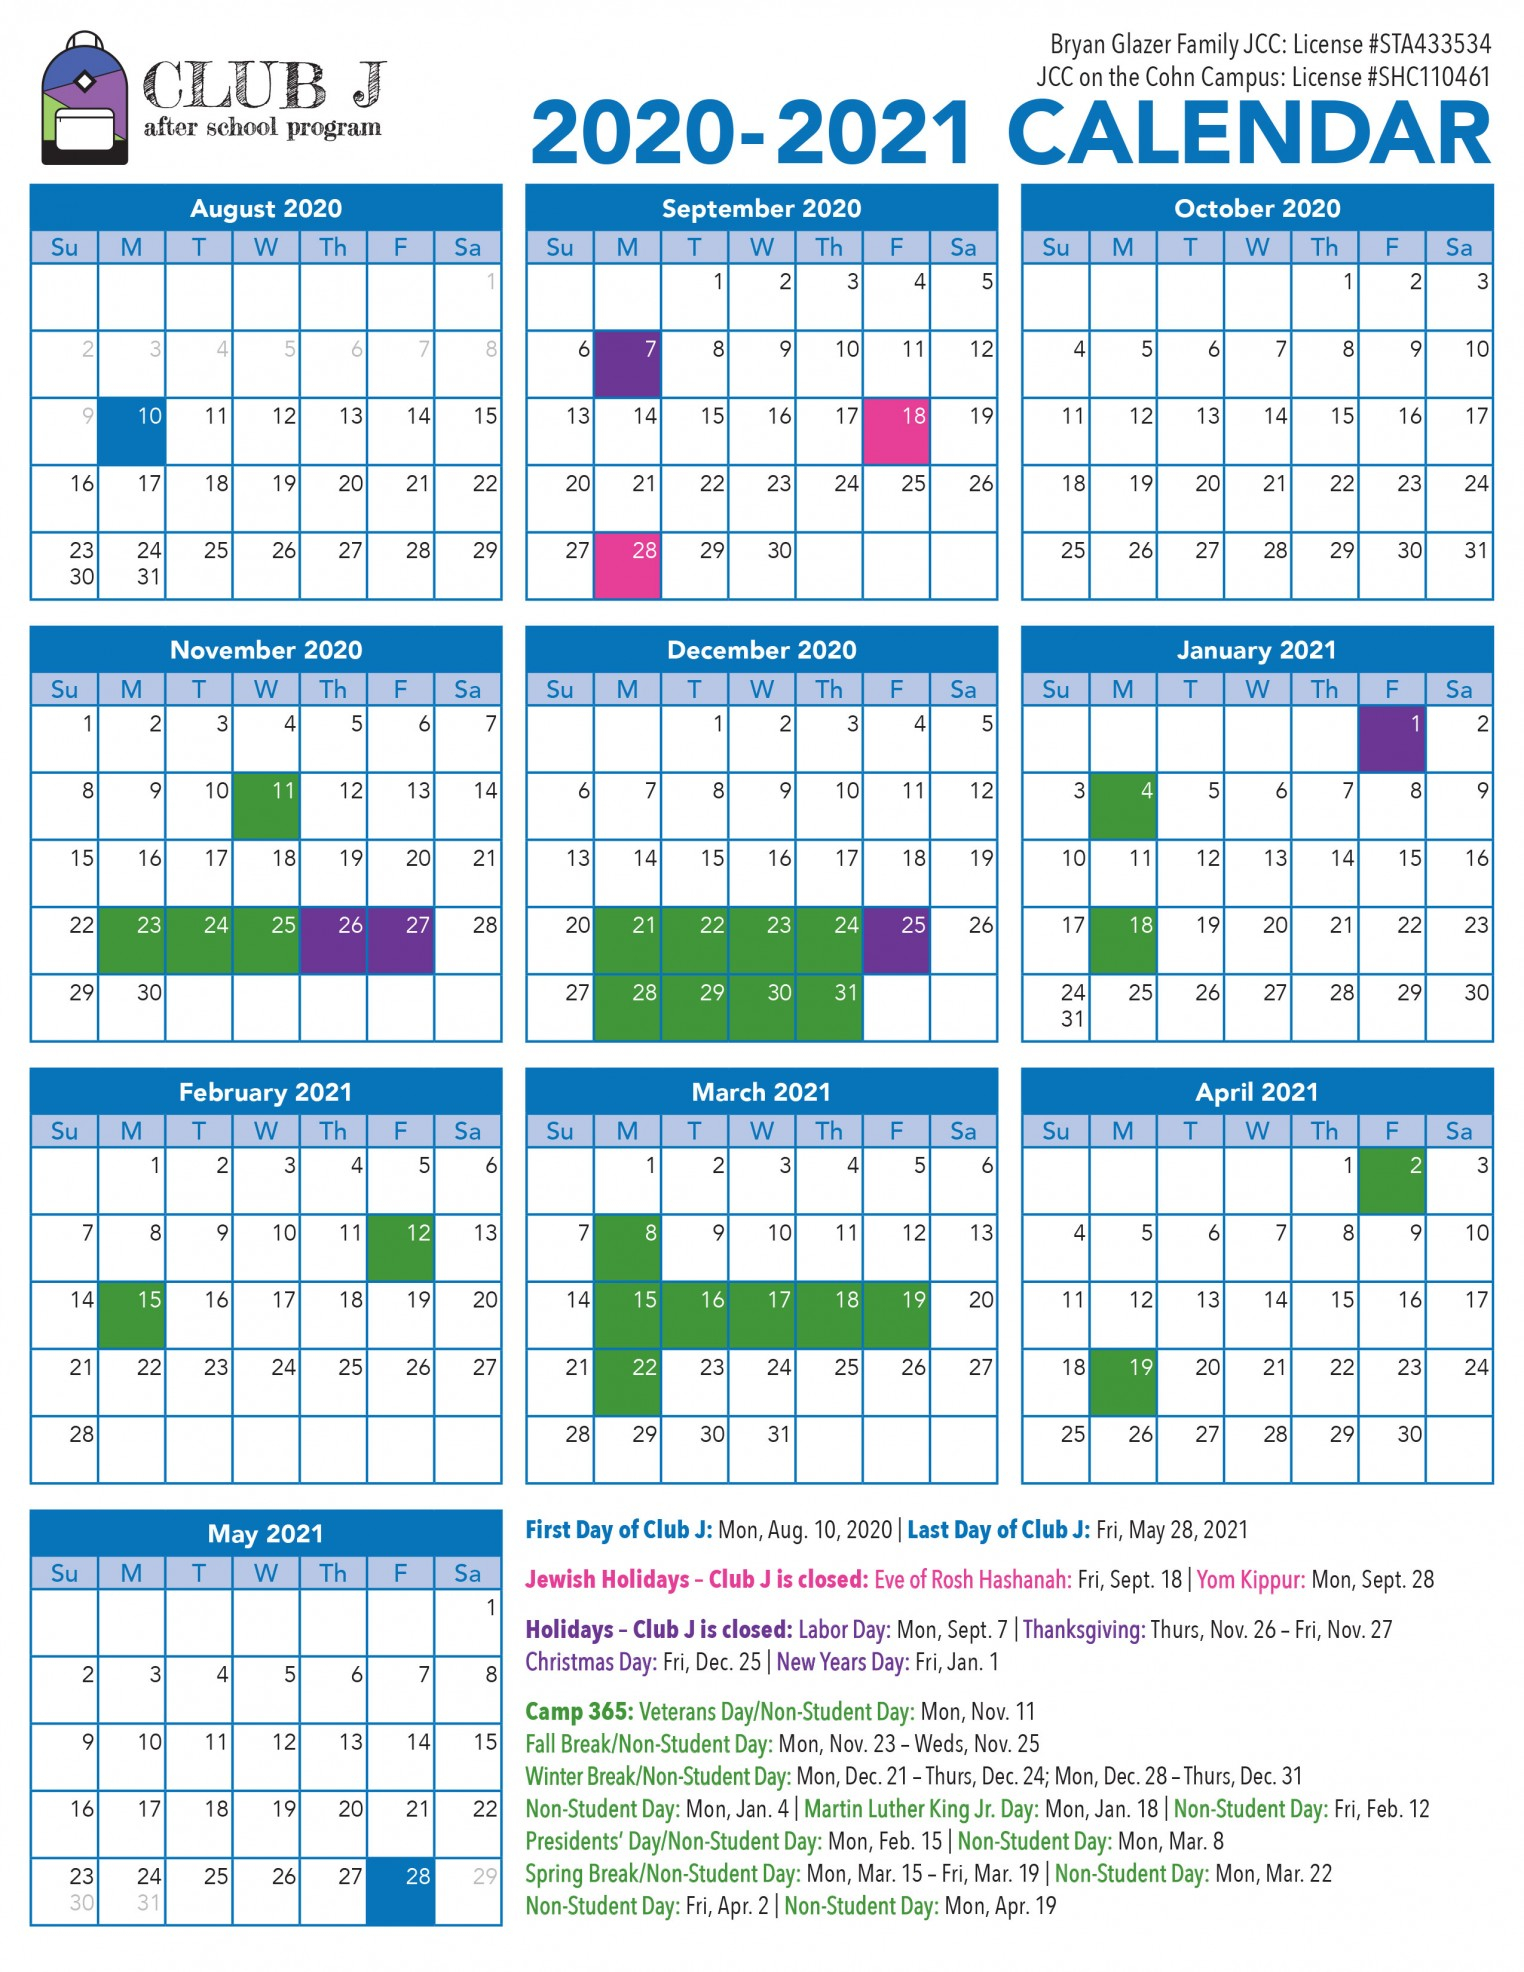 Club J After School Enrichment Program Located In Citrus Inside Bay County School Calendar 2020 2021